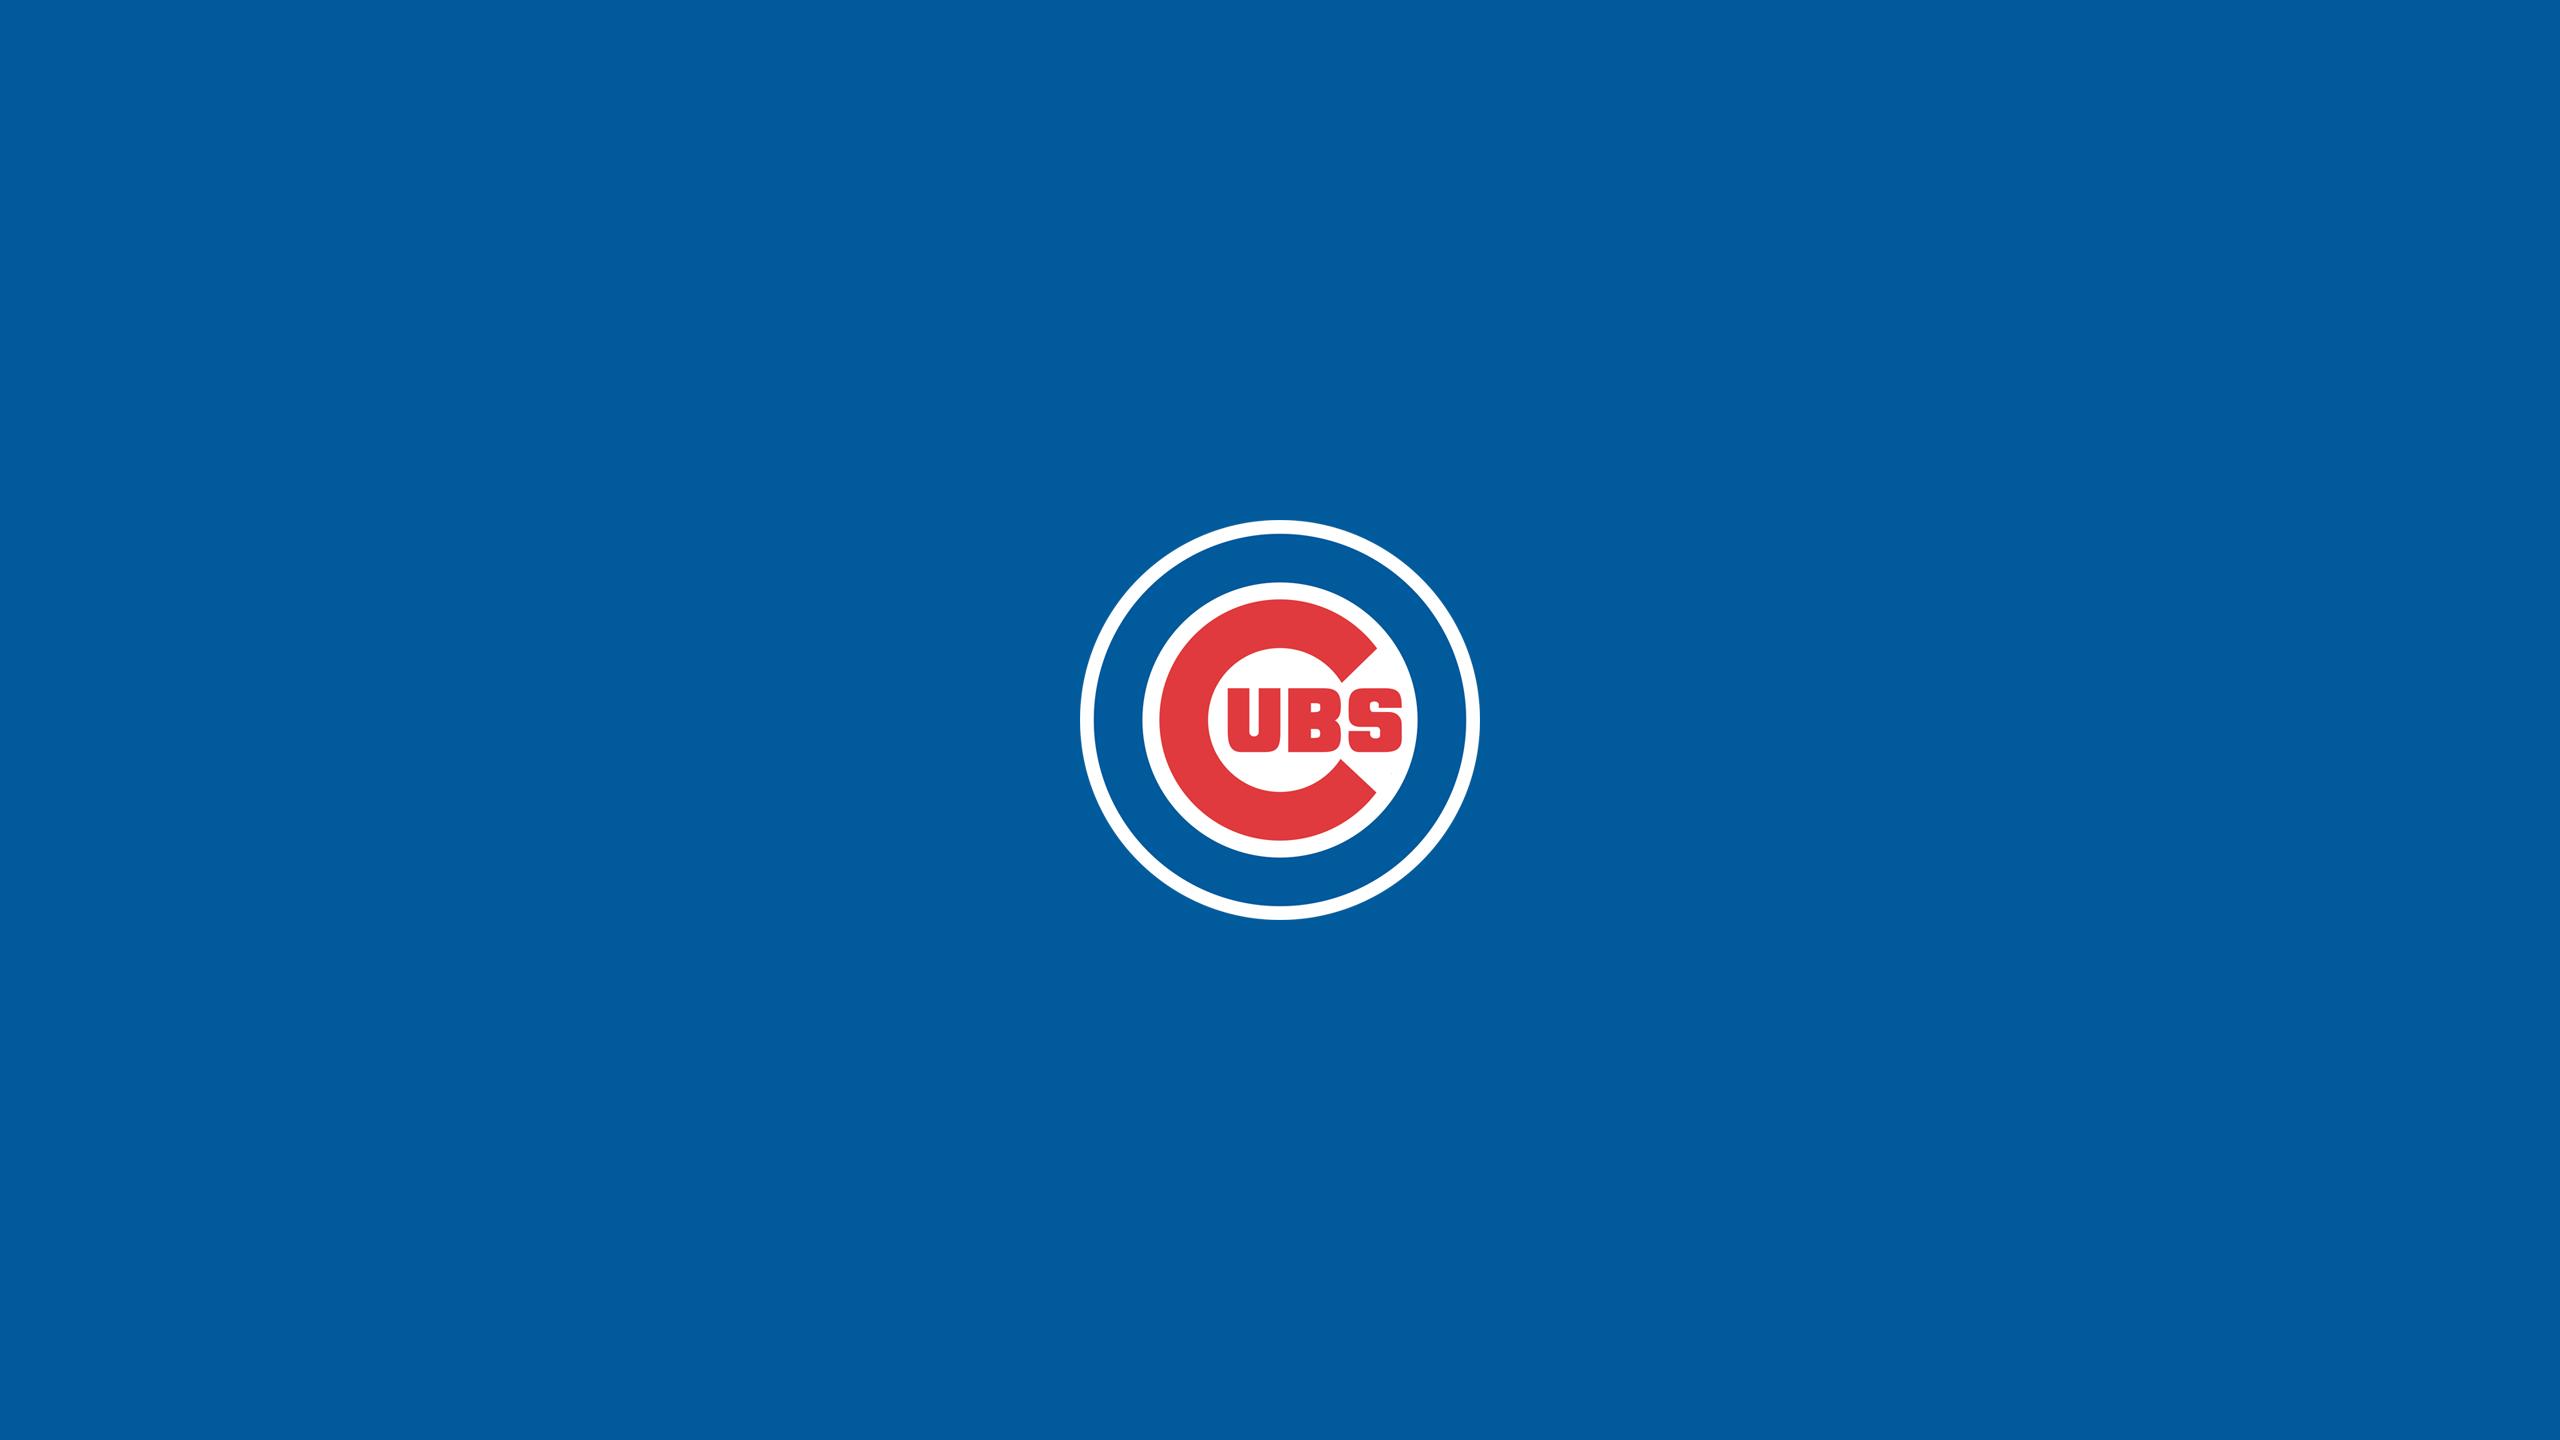 Chicago Cubs Wallpaper 2560x1440